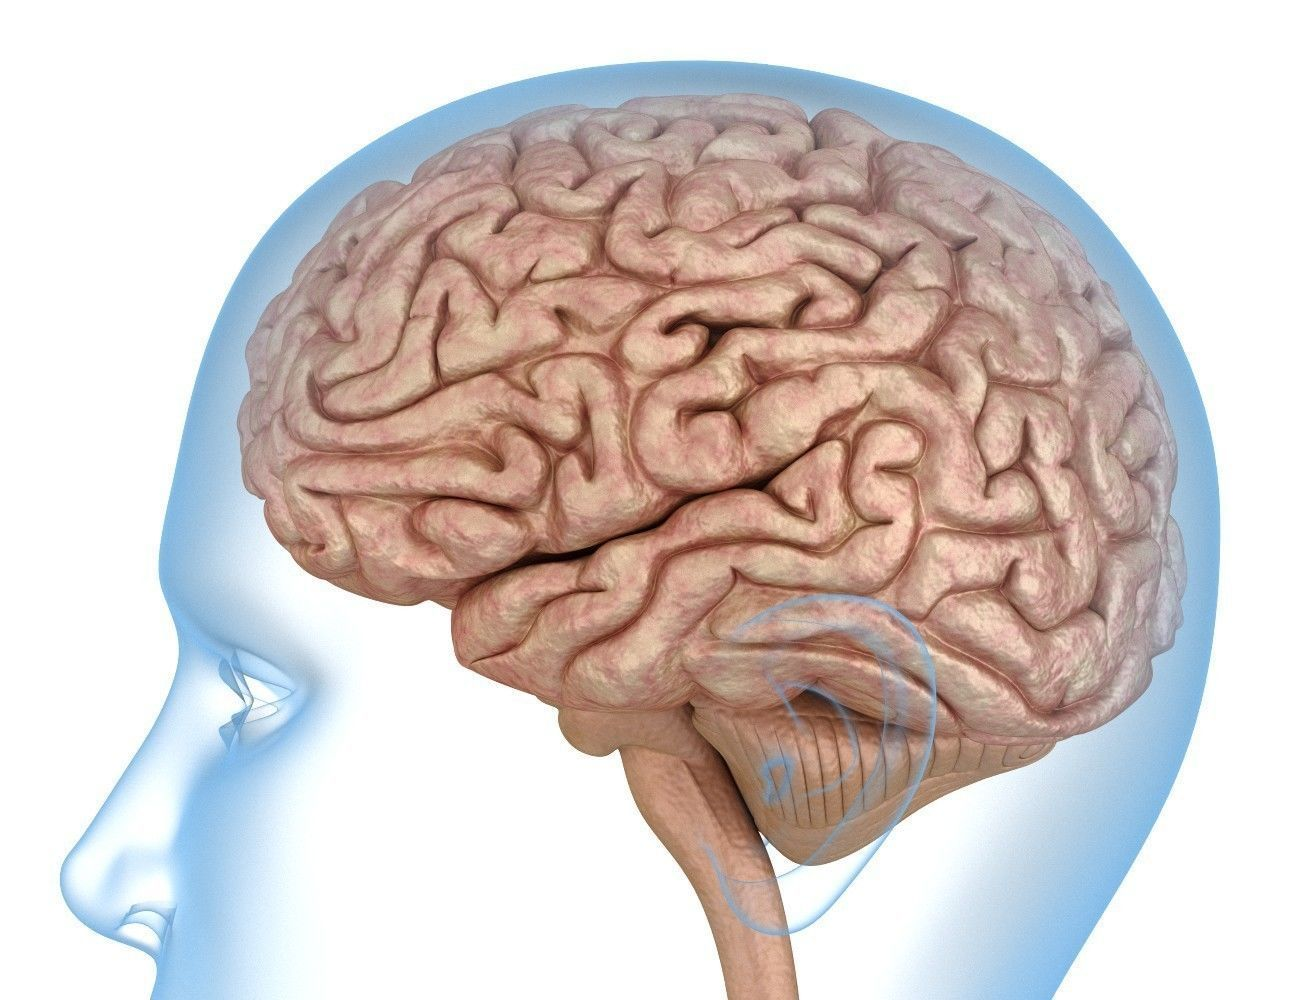 Human Brain Anatomy 3d Model